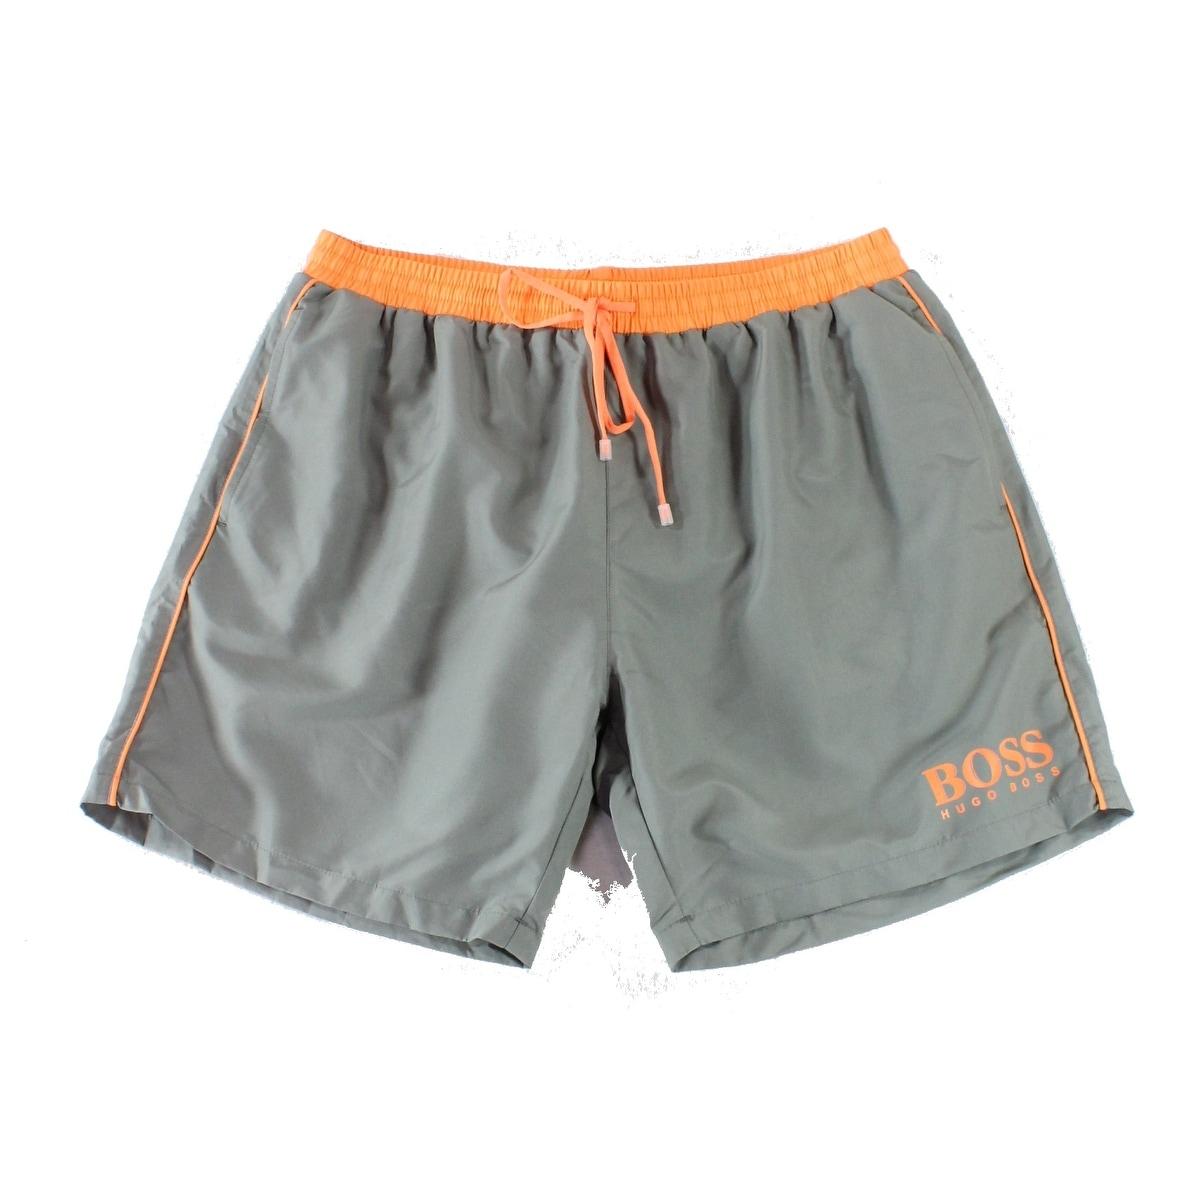 7aff75a6e Shop Hugo Boss Gray Orange Mens Size XL Board Shorts Drawstring Swimwear -  Ships To Canada - Overstock - 26911853